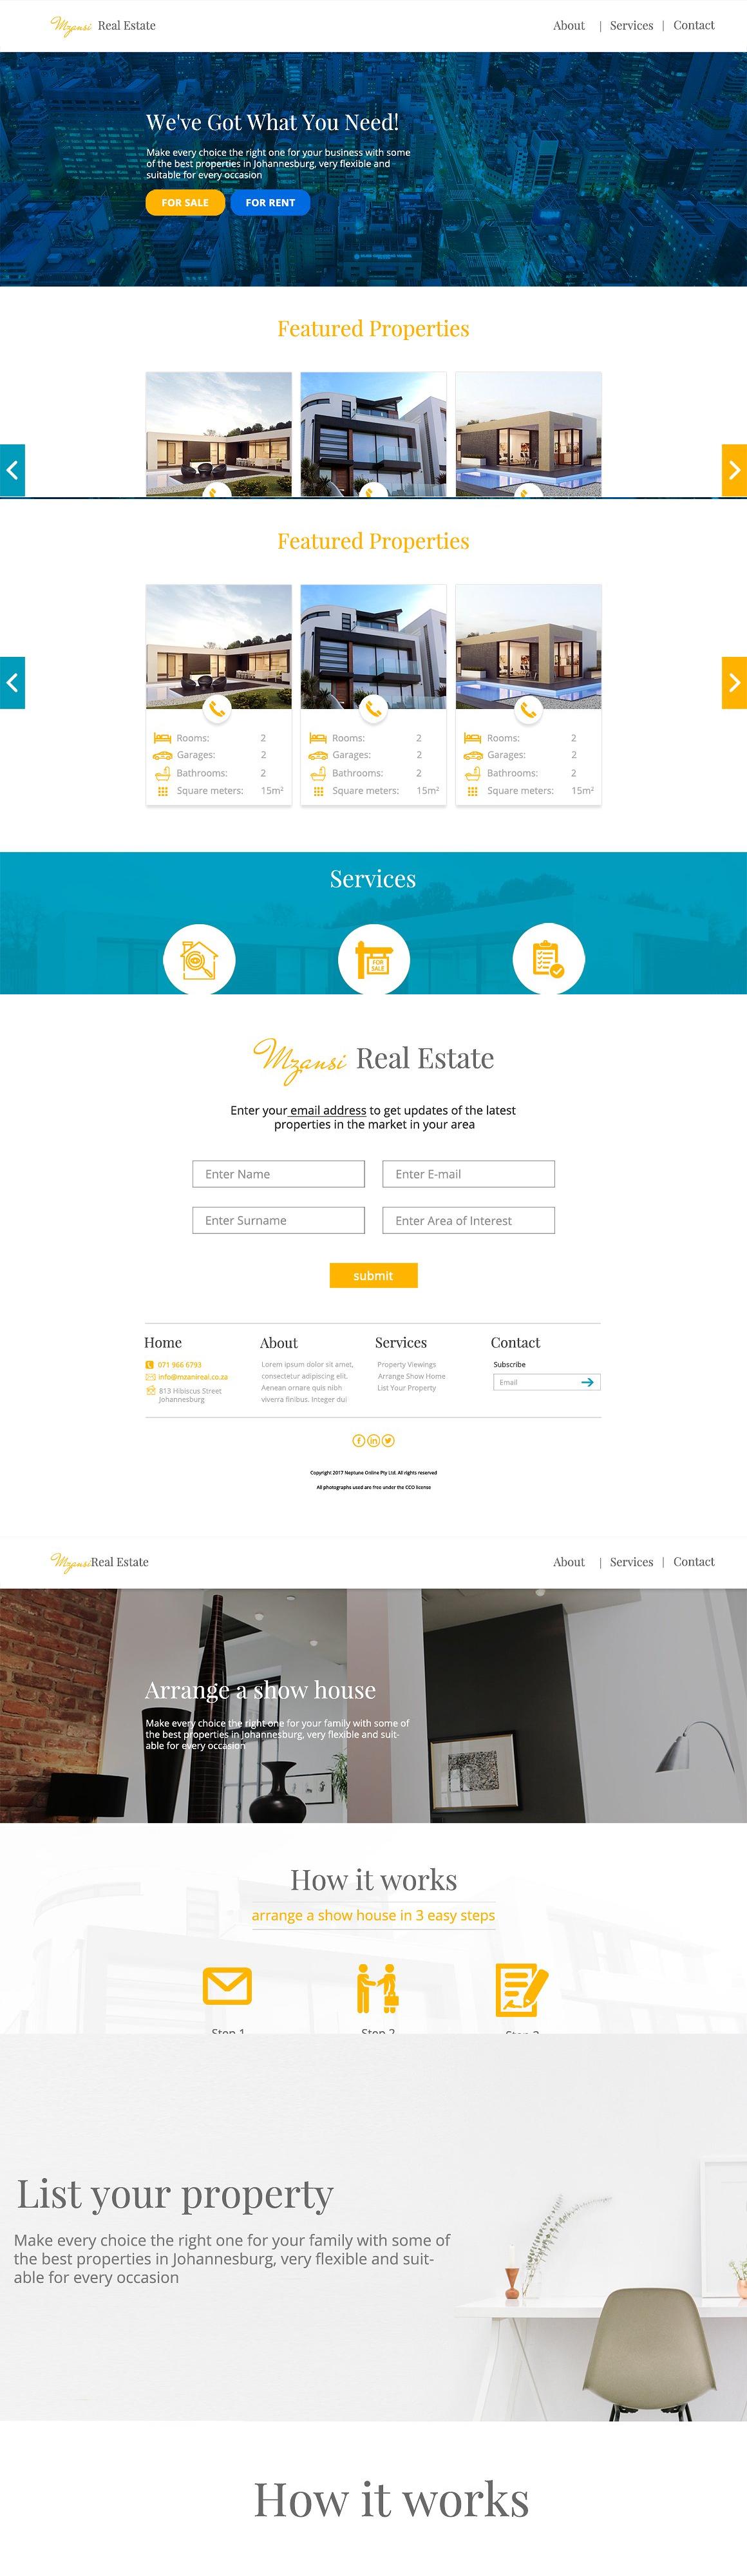 Minimalistic Real Estate Website PSD | web design | Pinterest